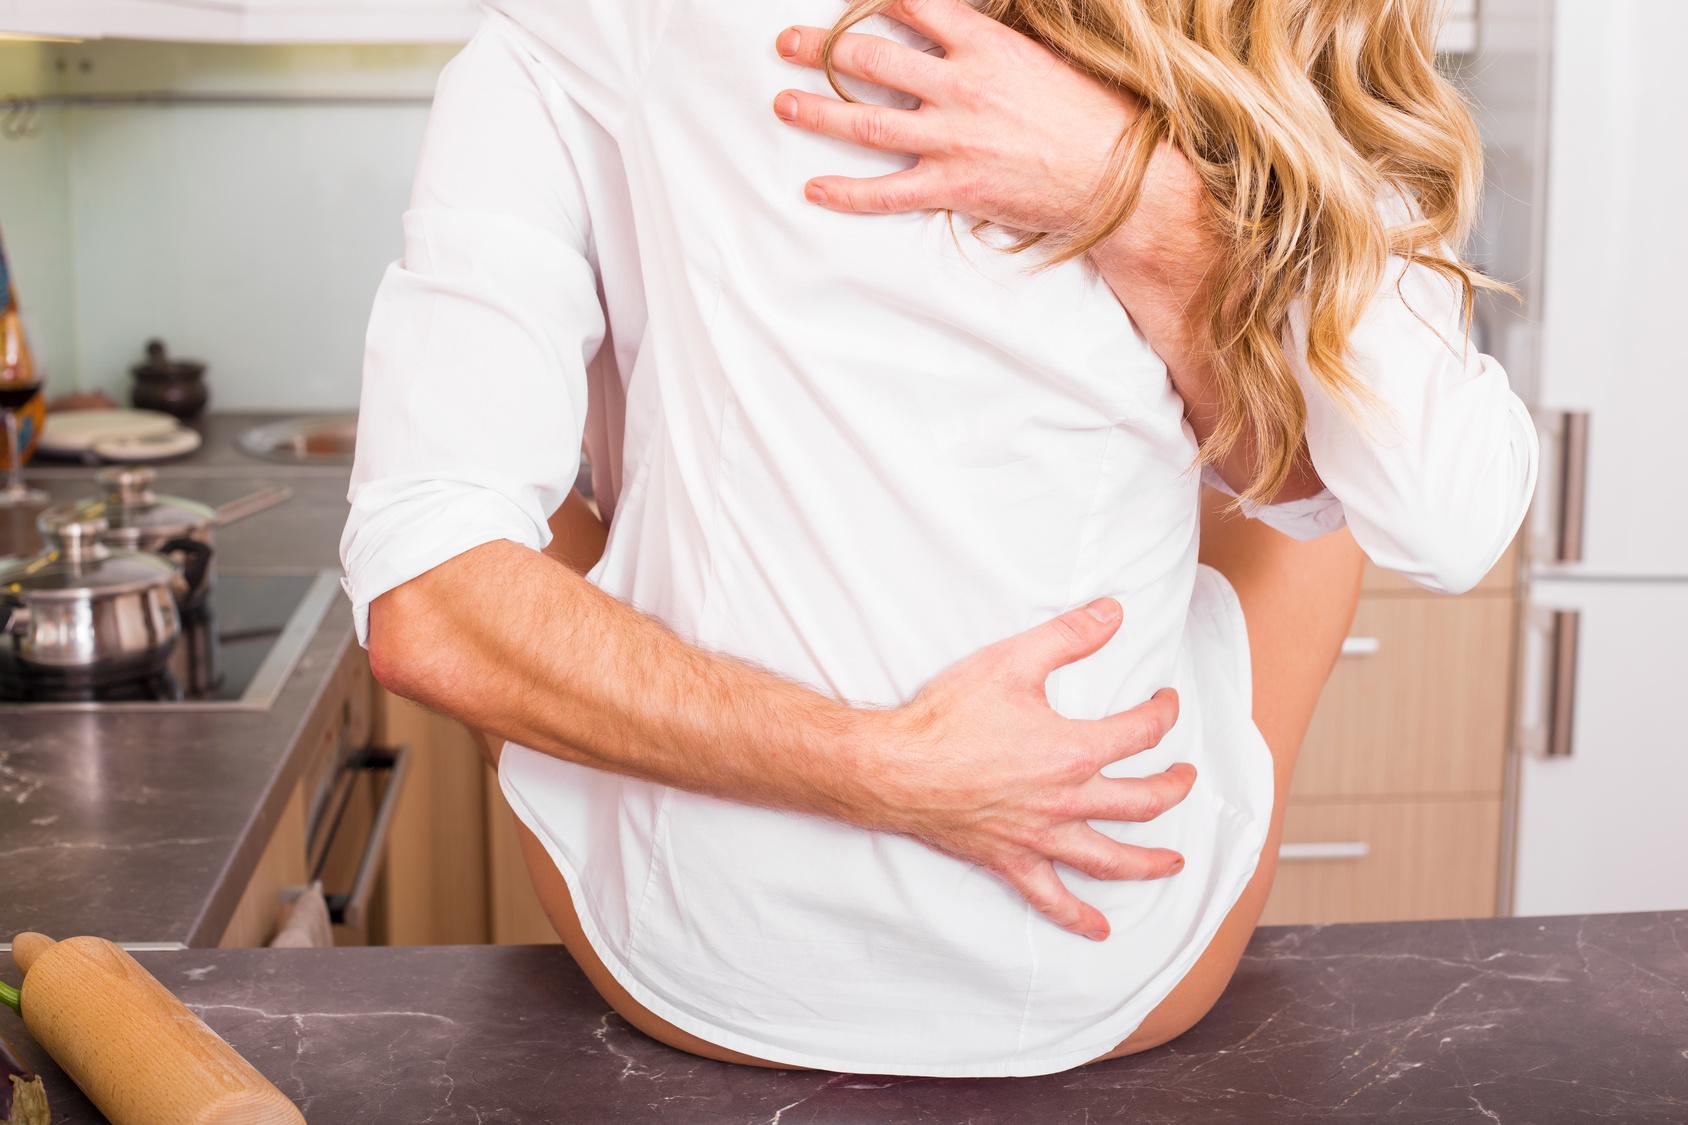 counter Sex on kitchen